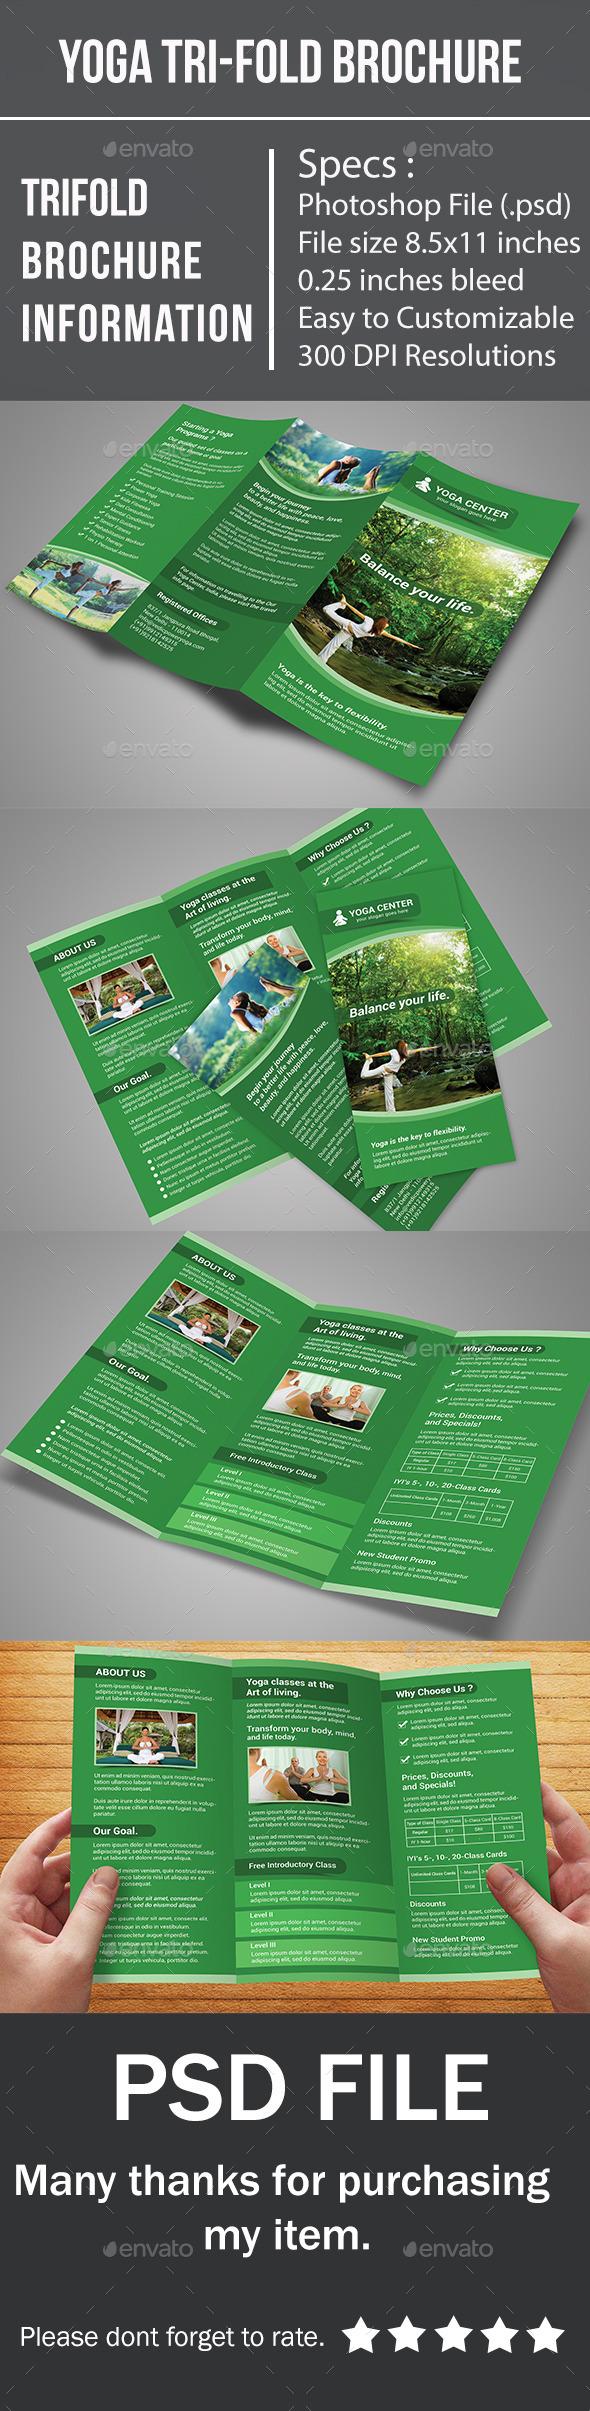 Yoga Tri-Fold Brochure - Corporate Brochures